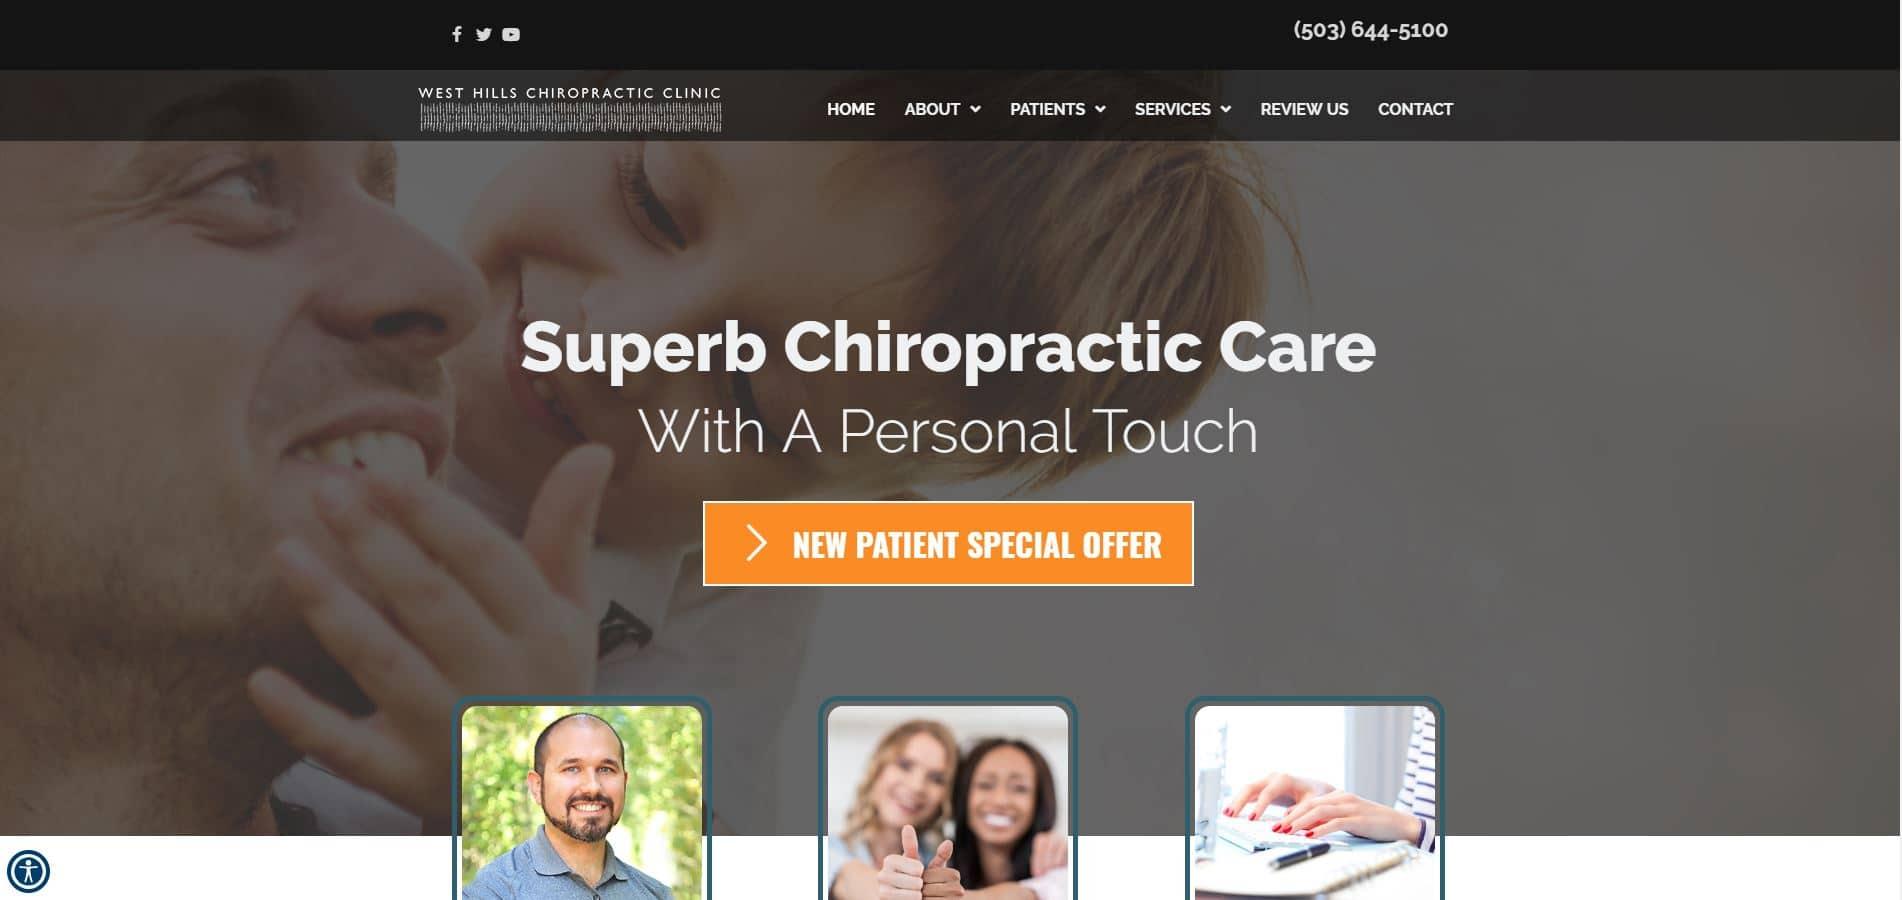 Chiropractor Portland OR West Hills Chiropractic Clinic